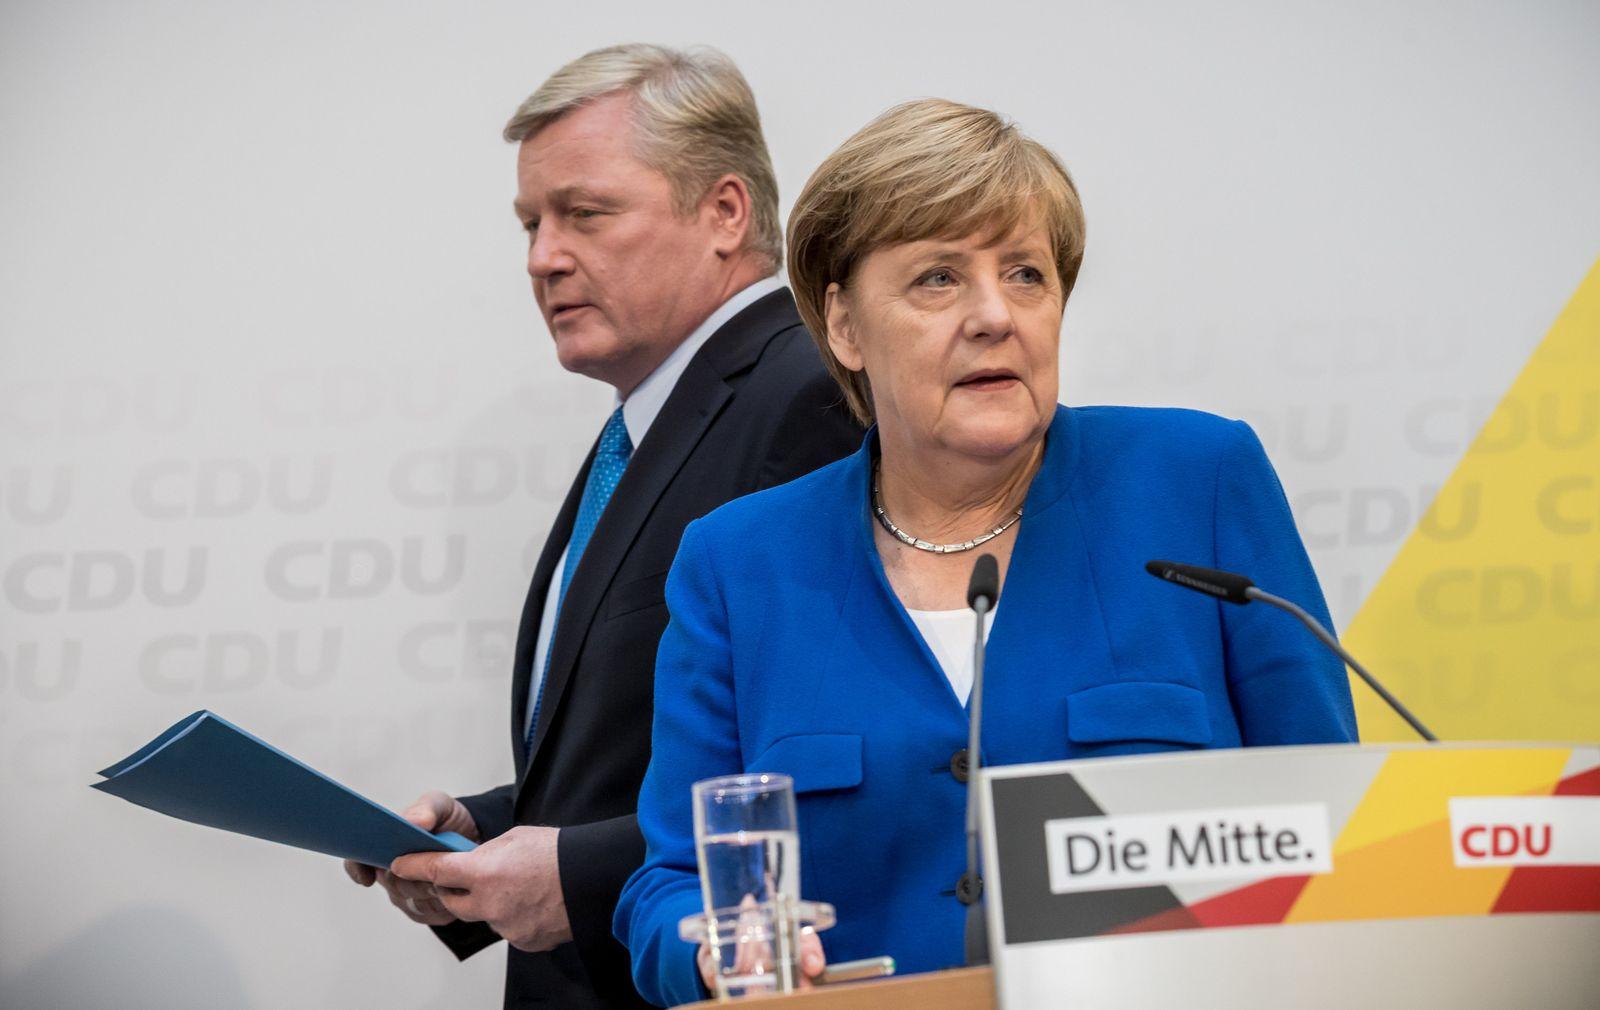 Niedersachsen - CDU Merkel